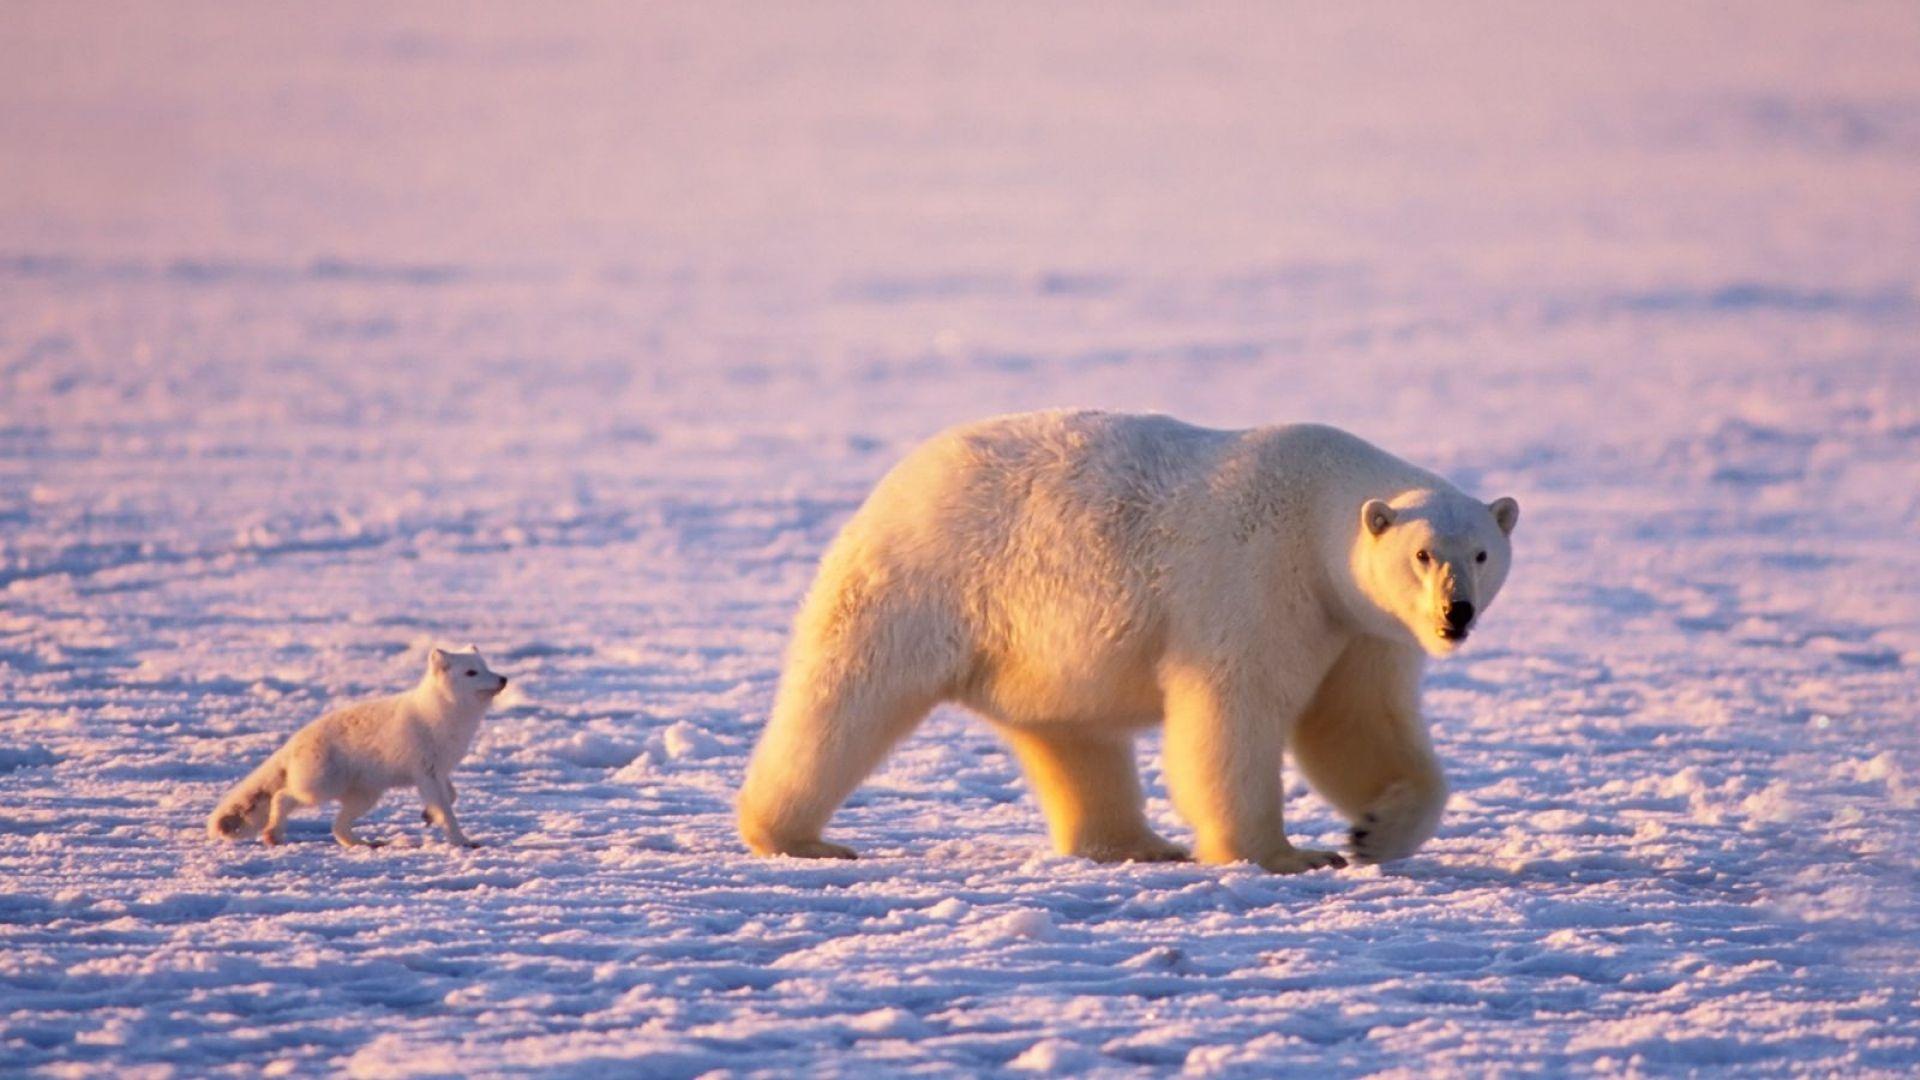 Download Wallpaper 1920x1080 Bear Polar Animal Snow Winter Full Hd 1080p Hd Background Polar Bear Wallpaper Polar Bear Polar Bear Facts